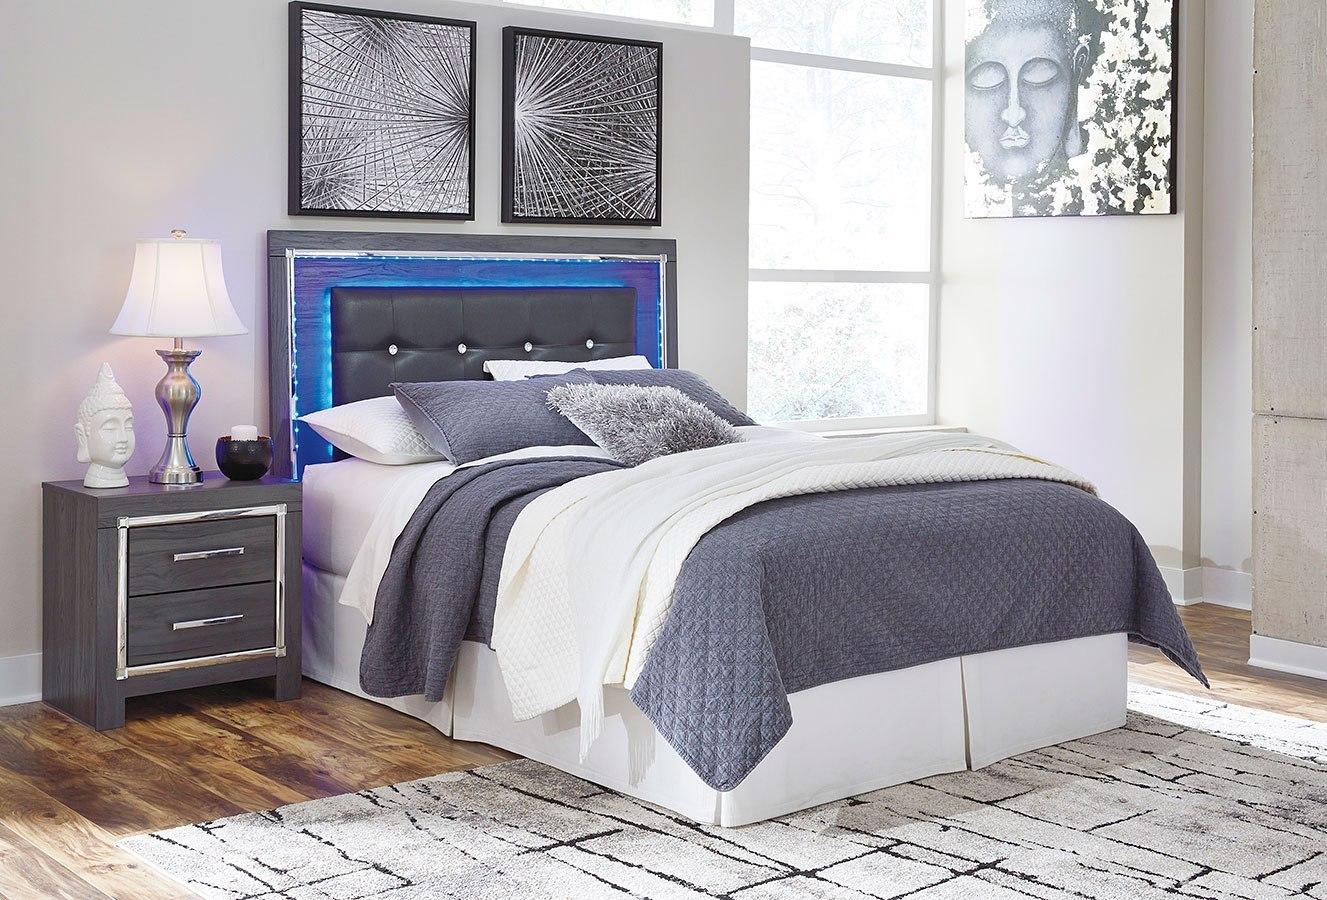 Lodanna Bed (Headboard Only) (Queen)